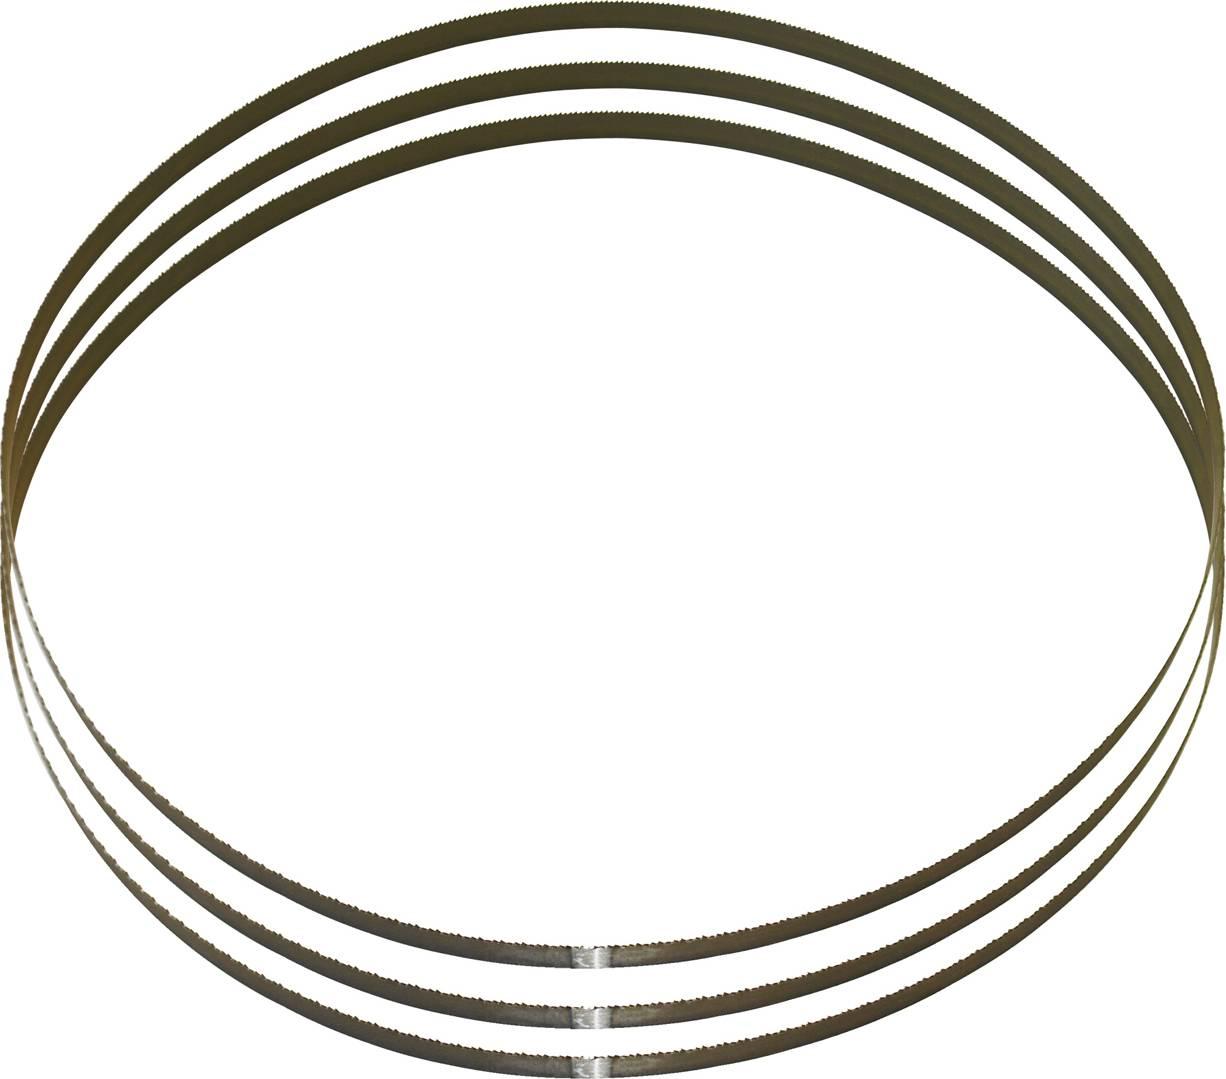 "Pilový pás k pile MBS 125 V, 1.435 x 13 x 0,65 mm (8-12 z/1"") 40545 GÜDE"